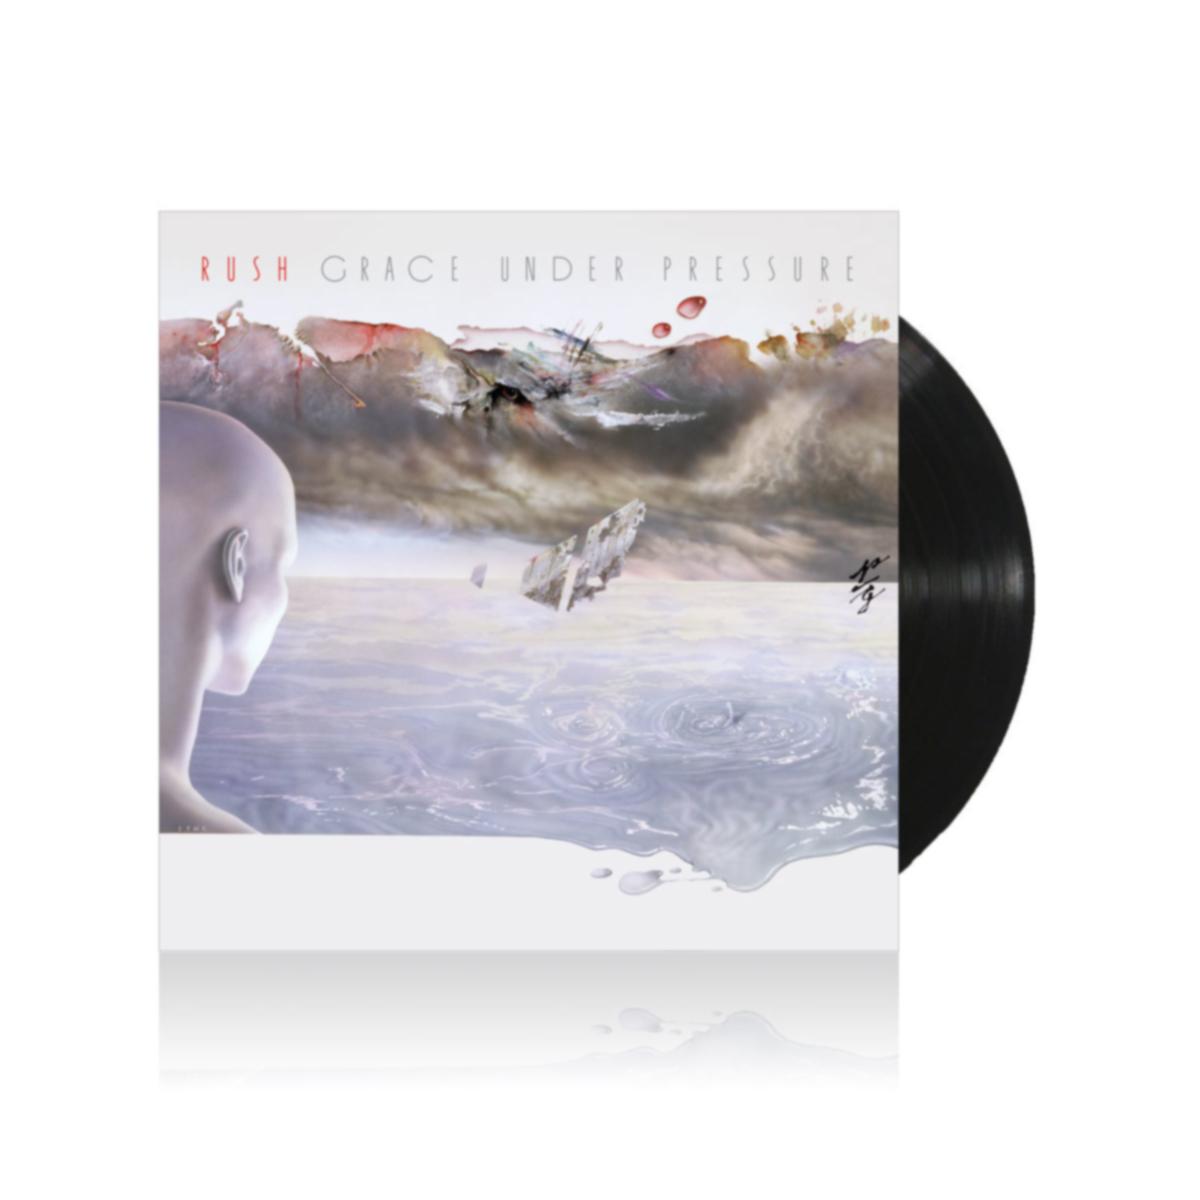 Vinyl - Rush Grace Under Pressure